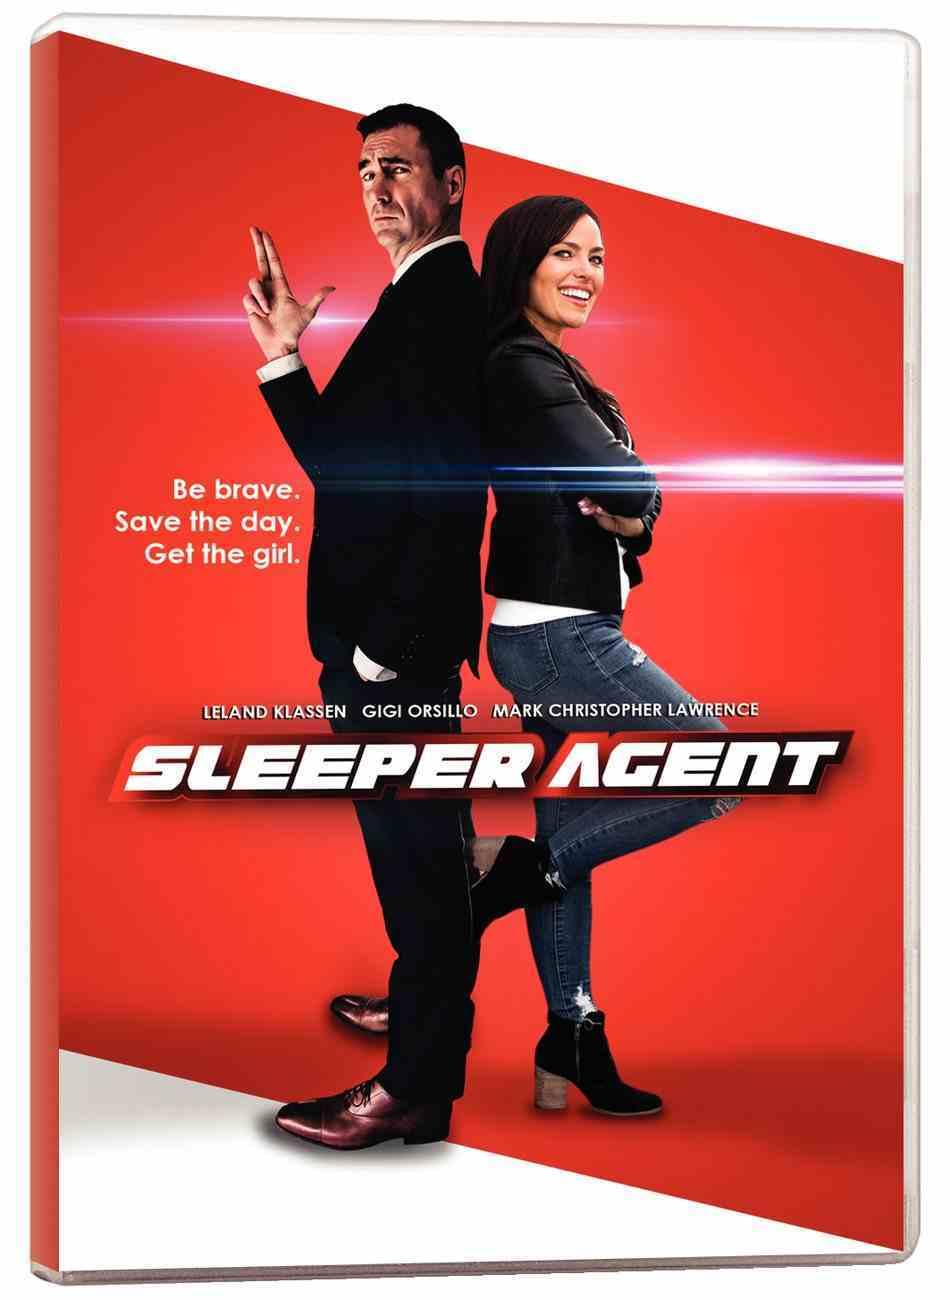 Sleeper Agent DVD